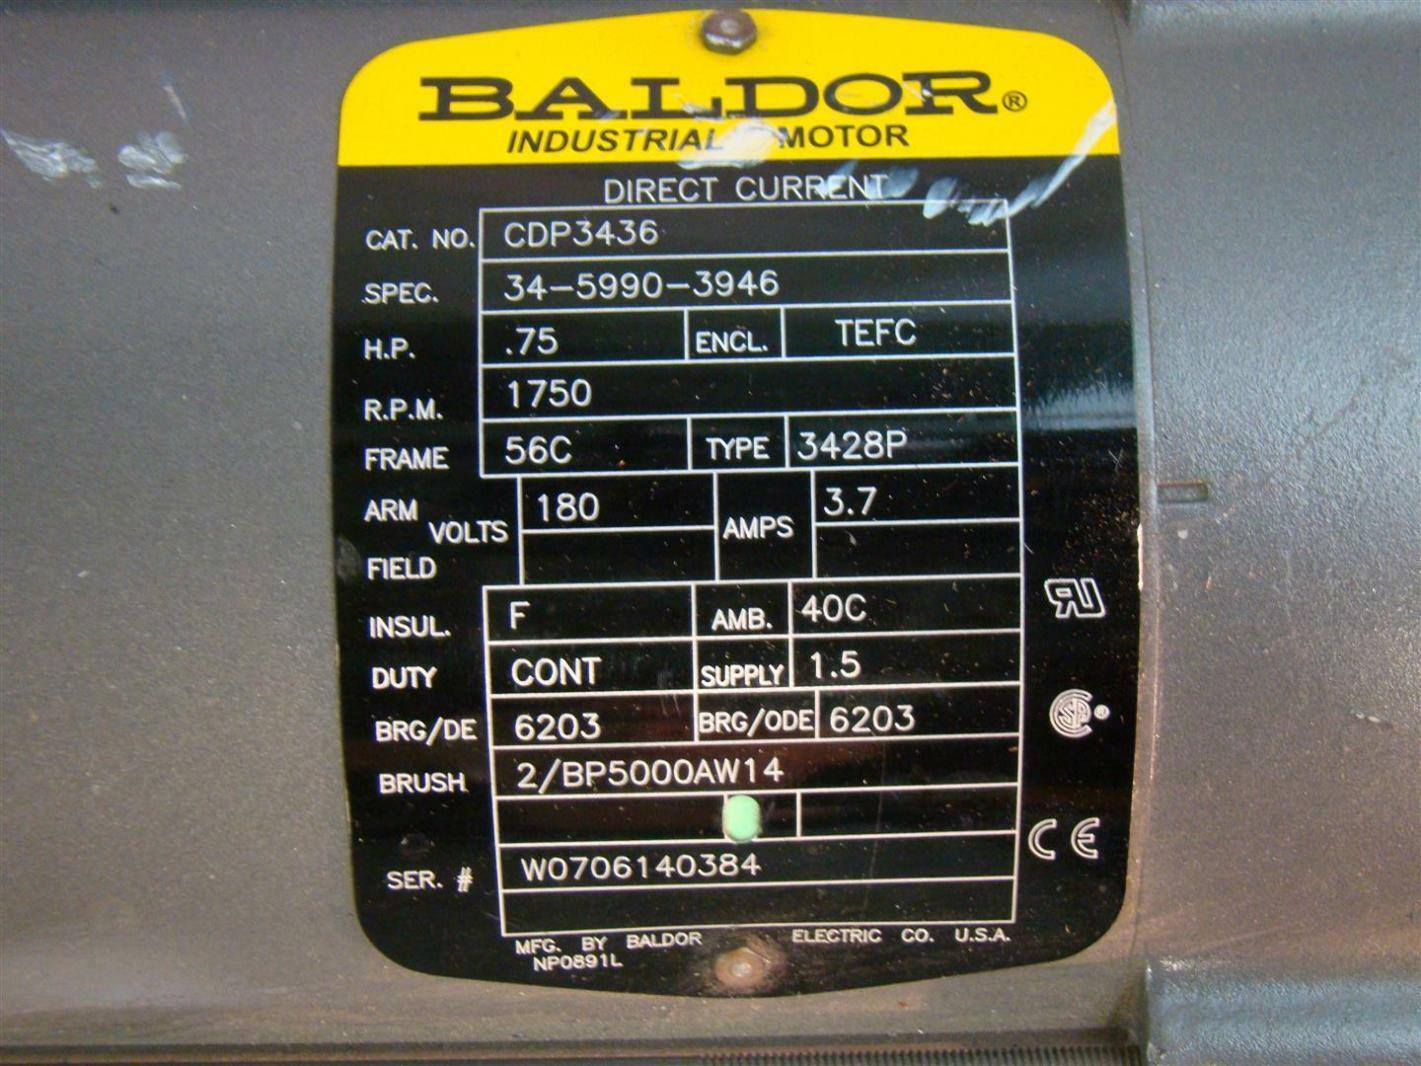 Baldor electric dc motor 75hp 1750rpm 180v cdp436 ebay for 180v dc motor suppliers